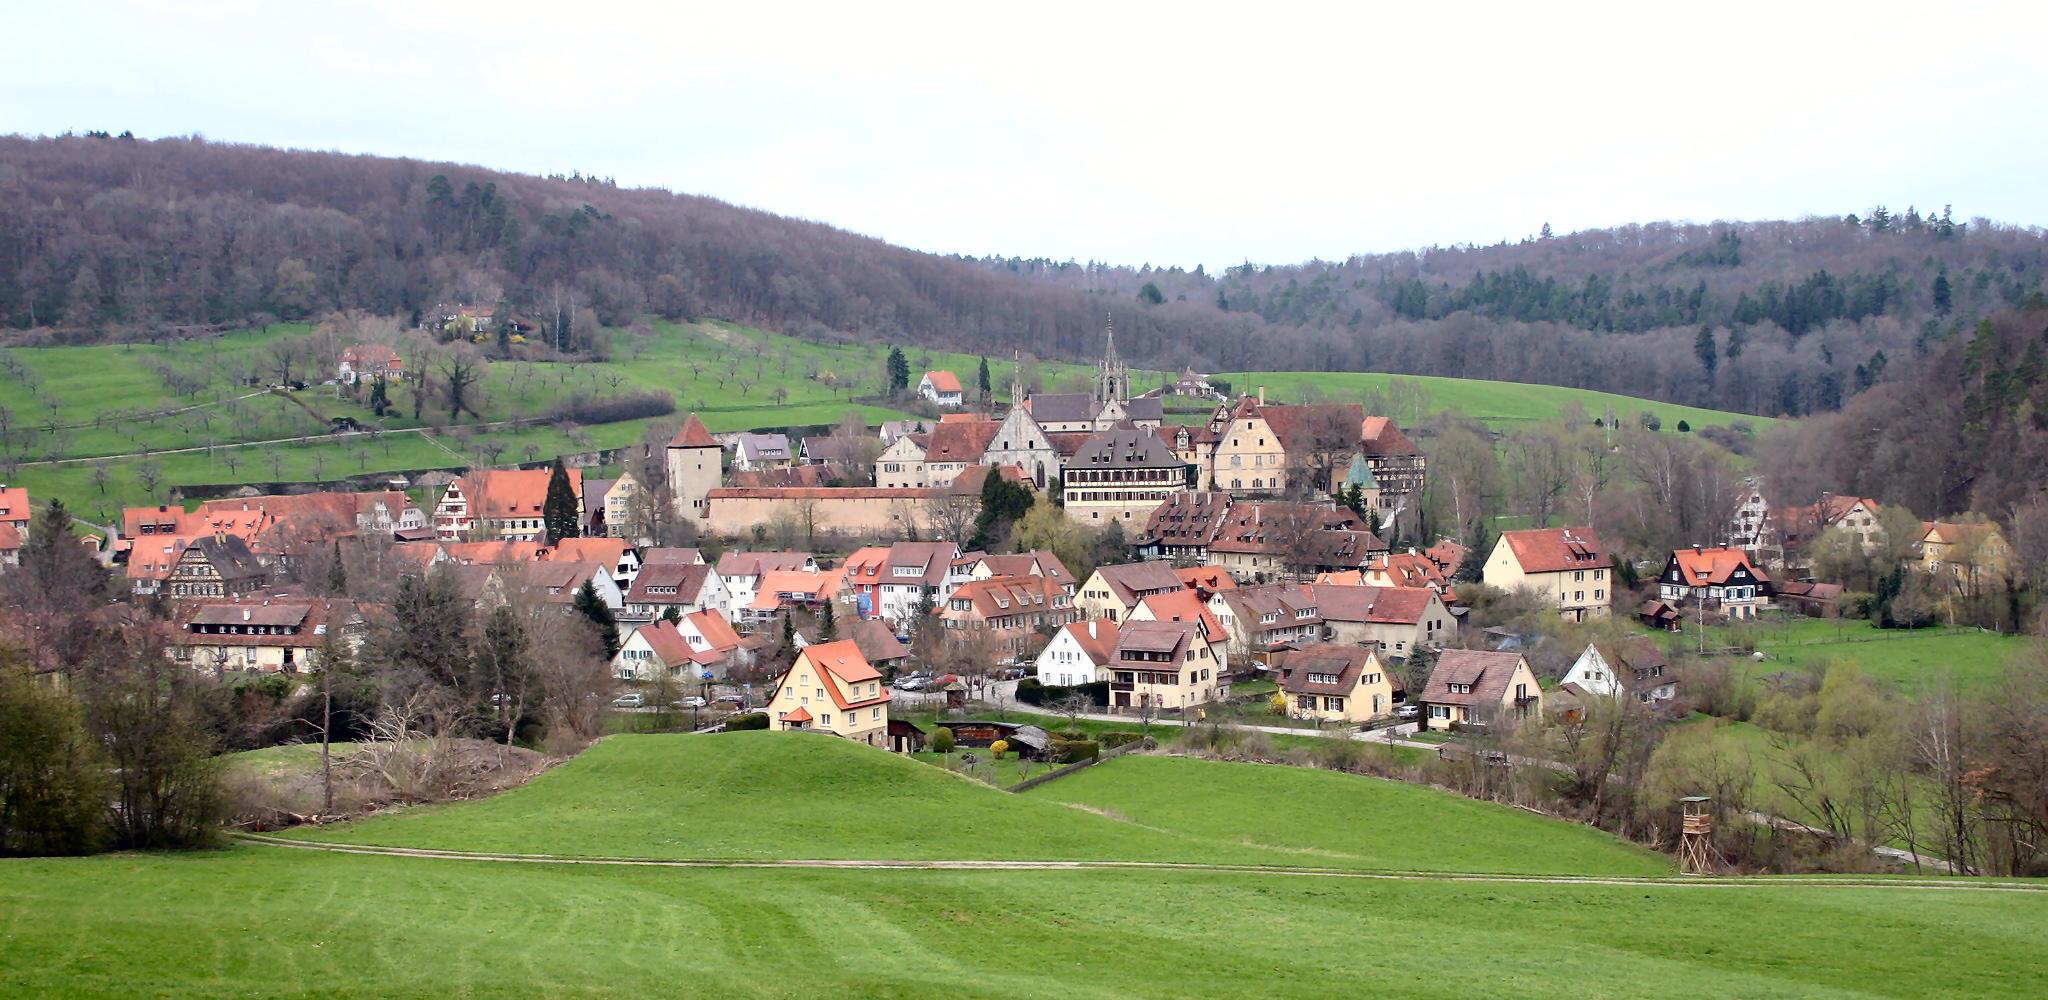 Depiction of Bebenhausen